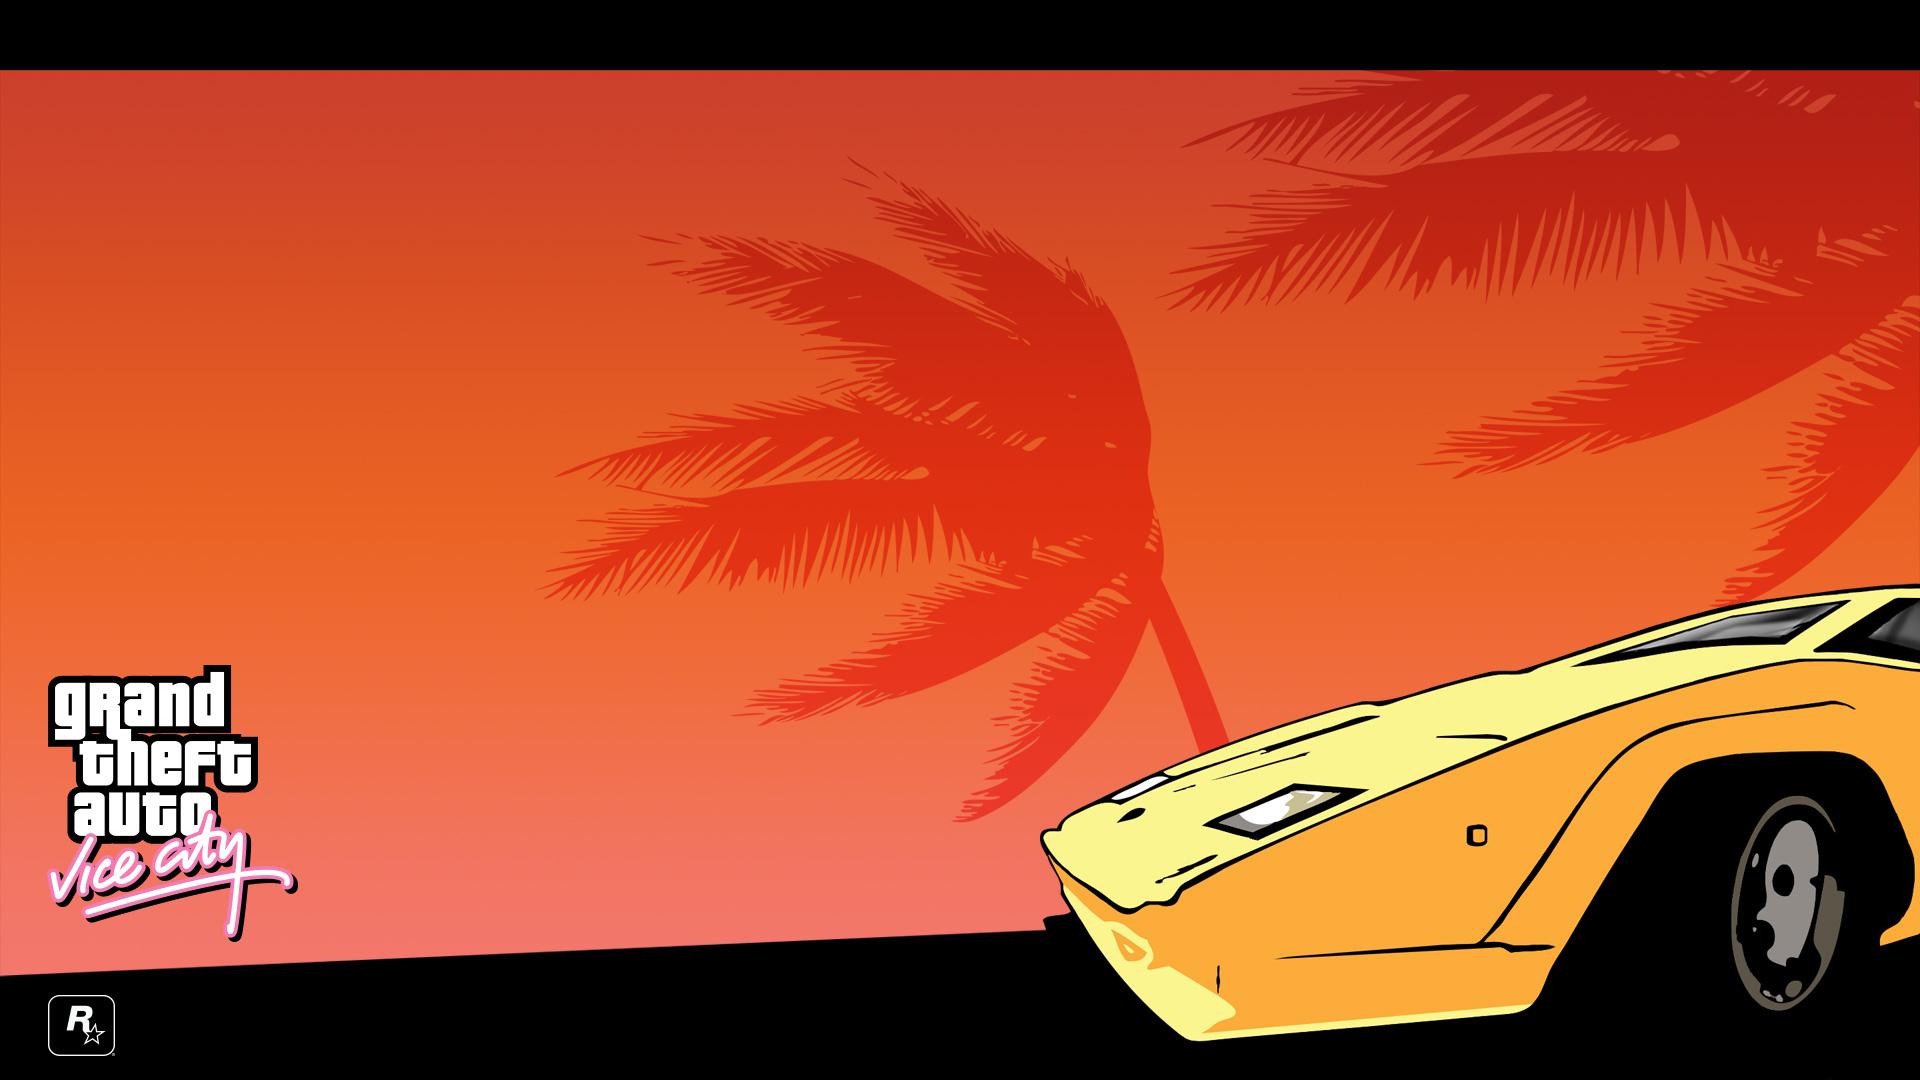 Grand Theft Auto On Vita : Wallpapers fond d ecran pour grand theft auto vice city